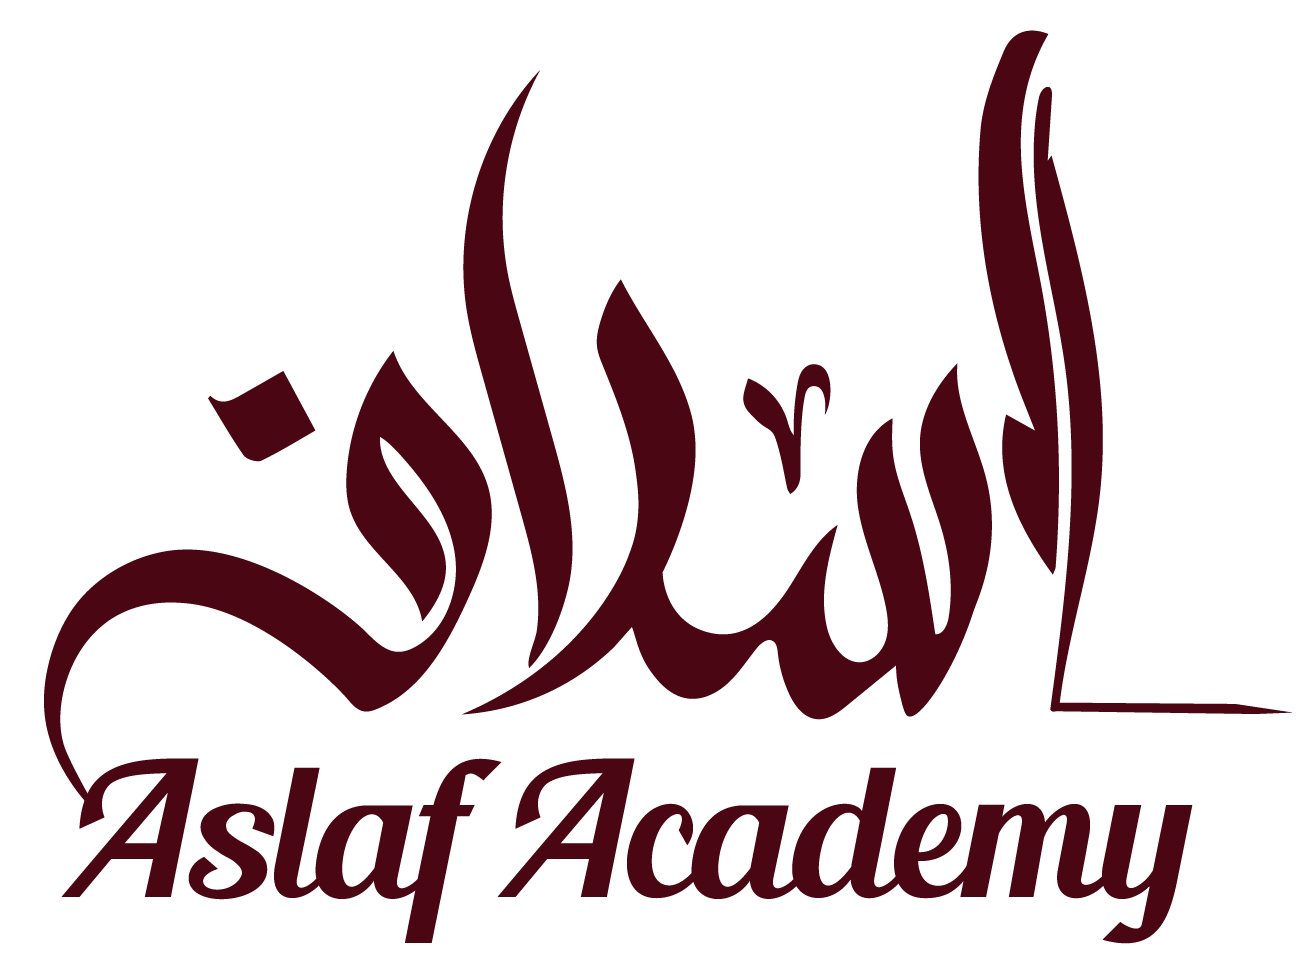 Aslaf Academy